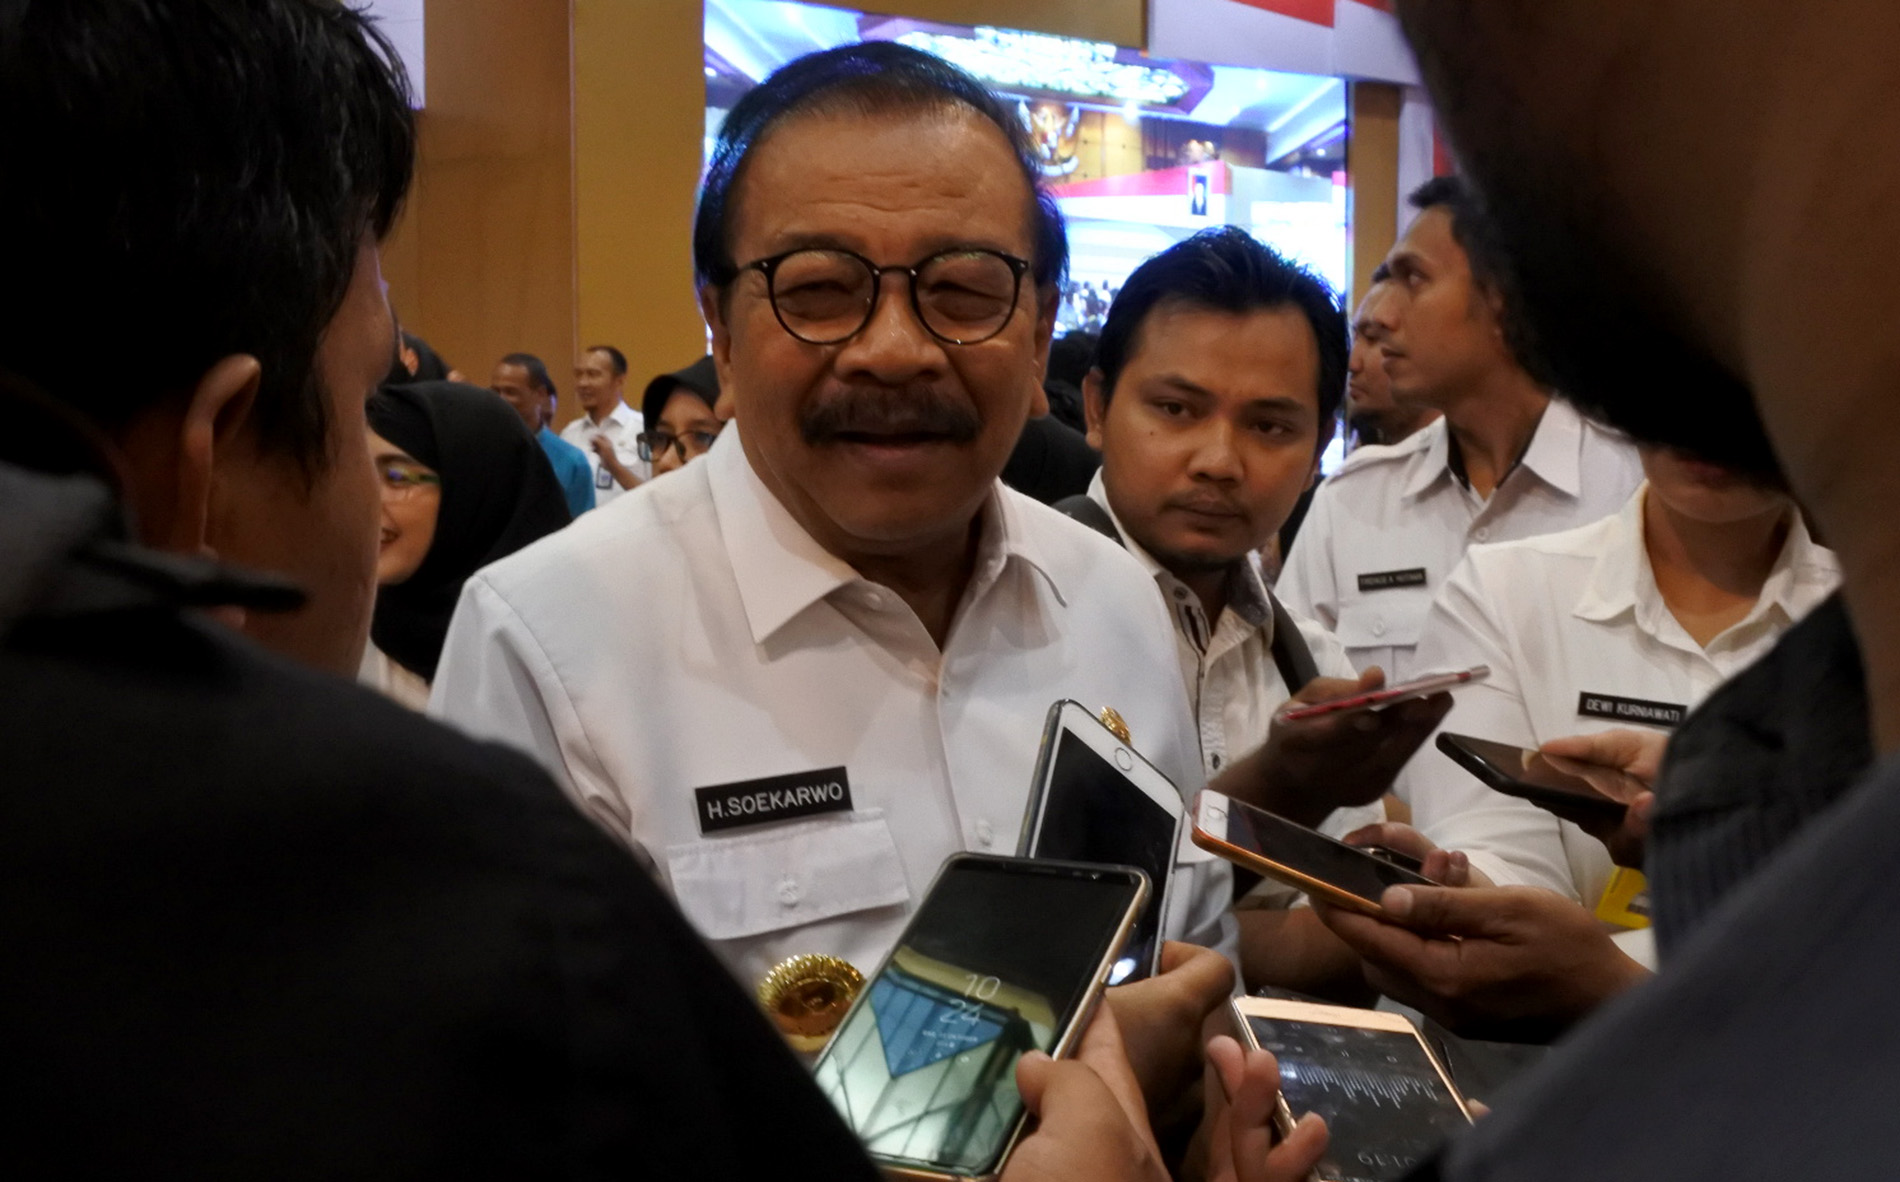 Pengamat Nilai Pidato Soekarwo Sarat Pesan Politis